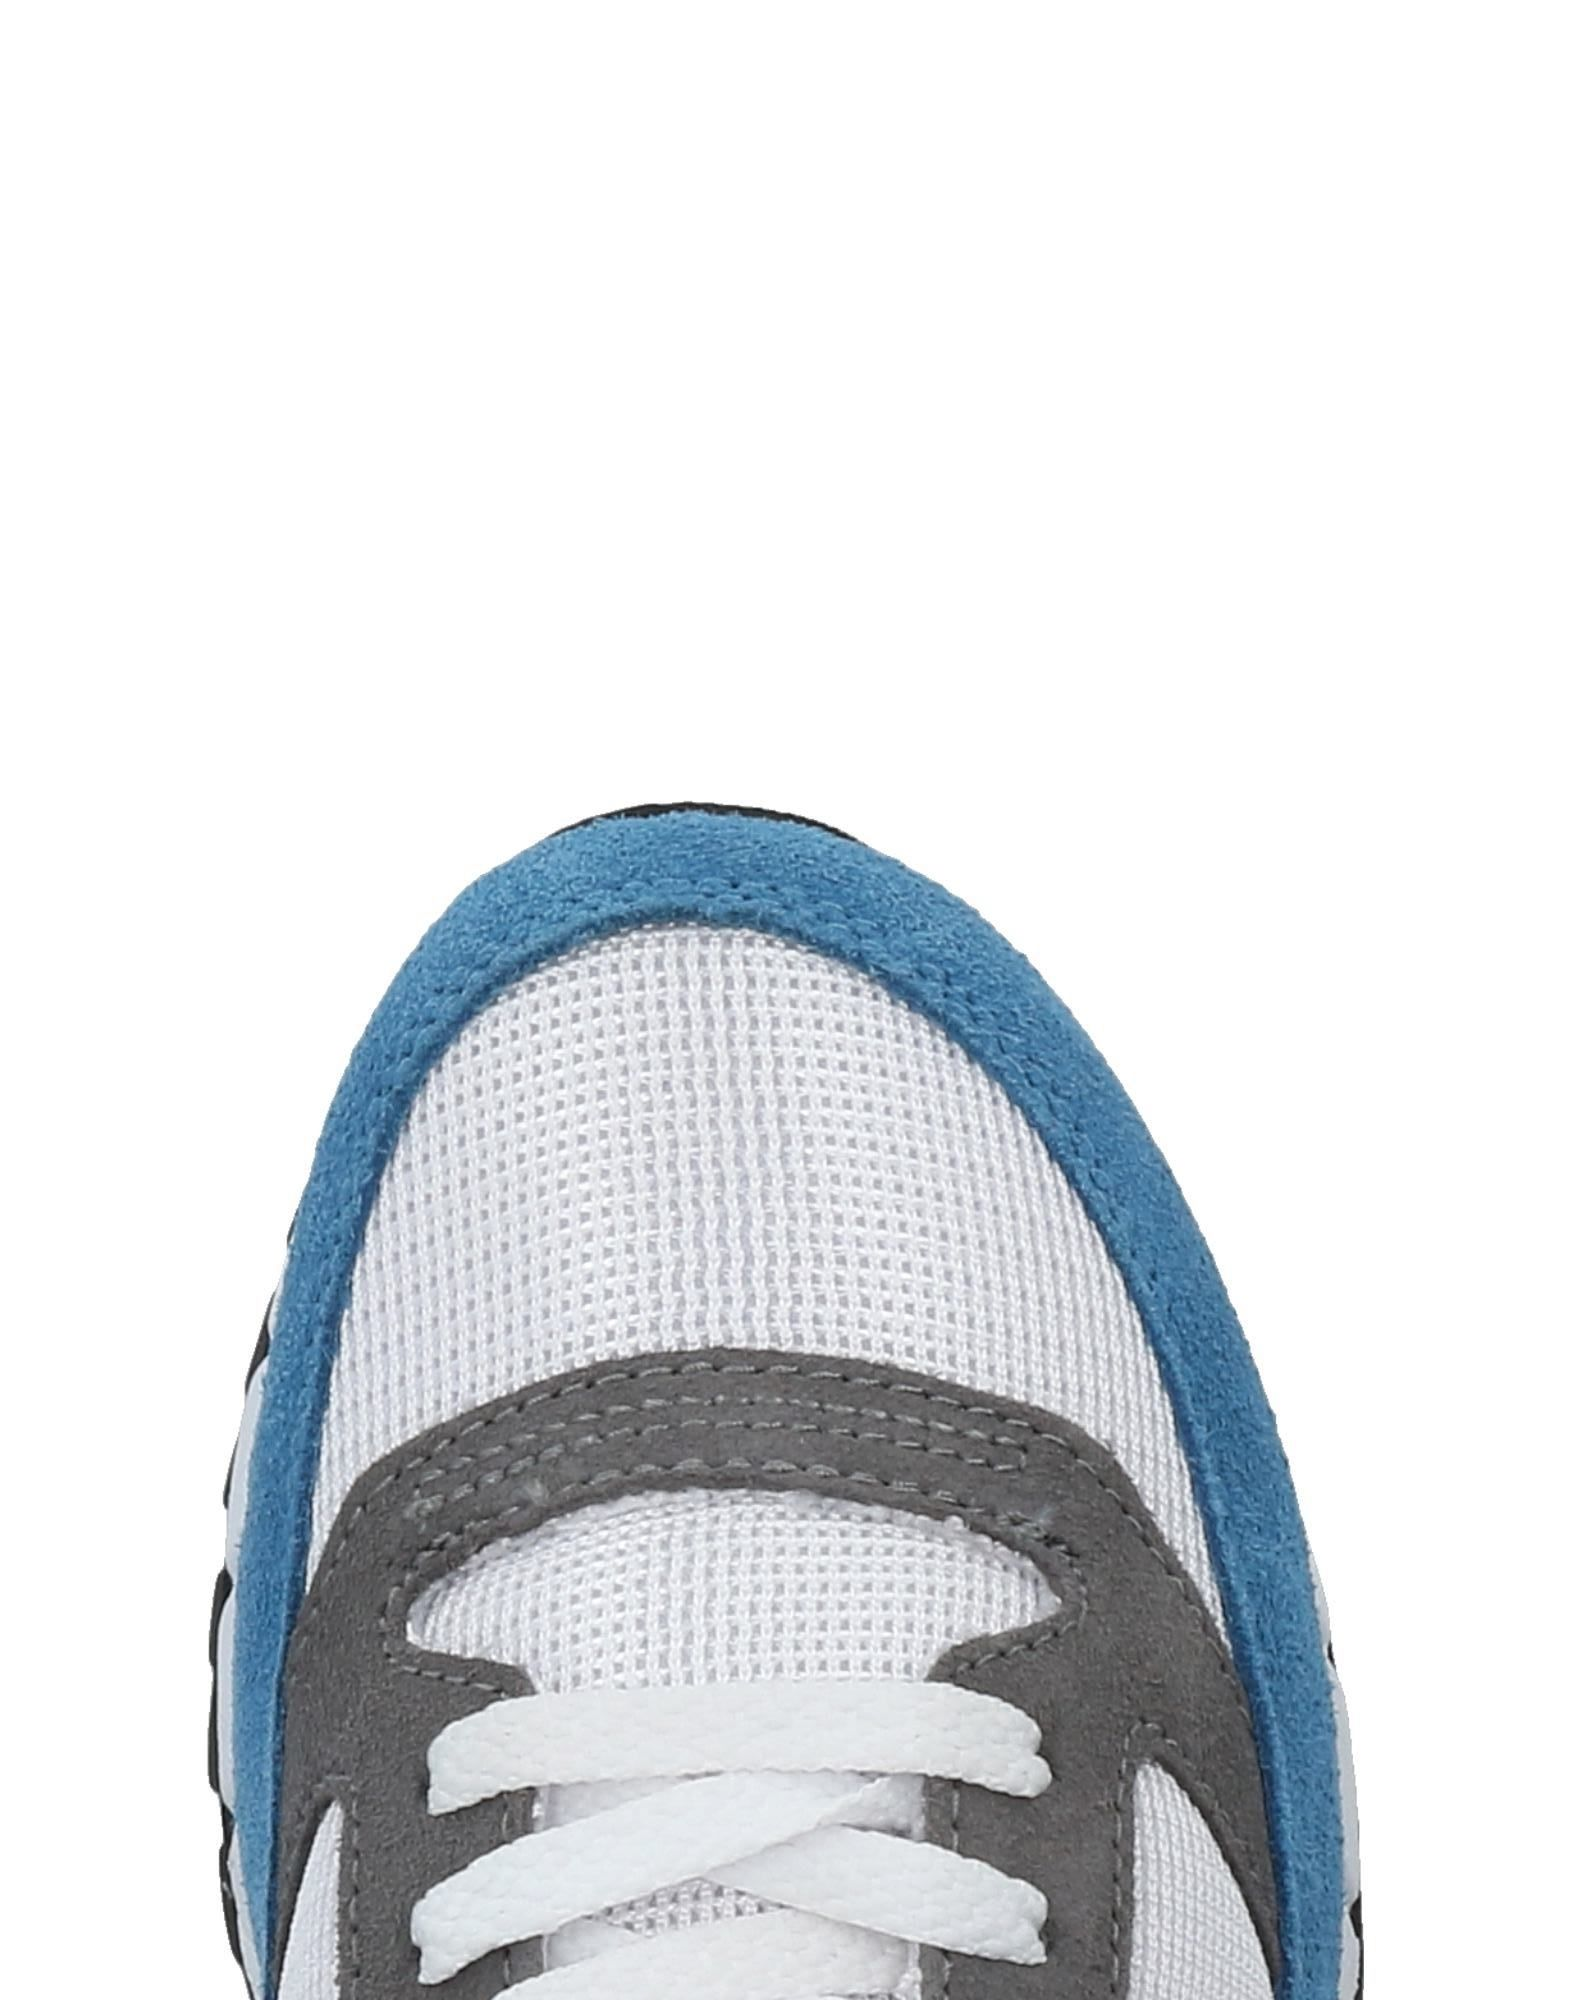 390d1b27e58a ... Rabatt echte Schuhe Saucony Sneakers Herren Saucony 11211756FR ce68b5